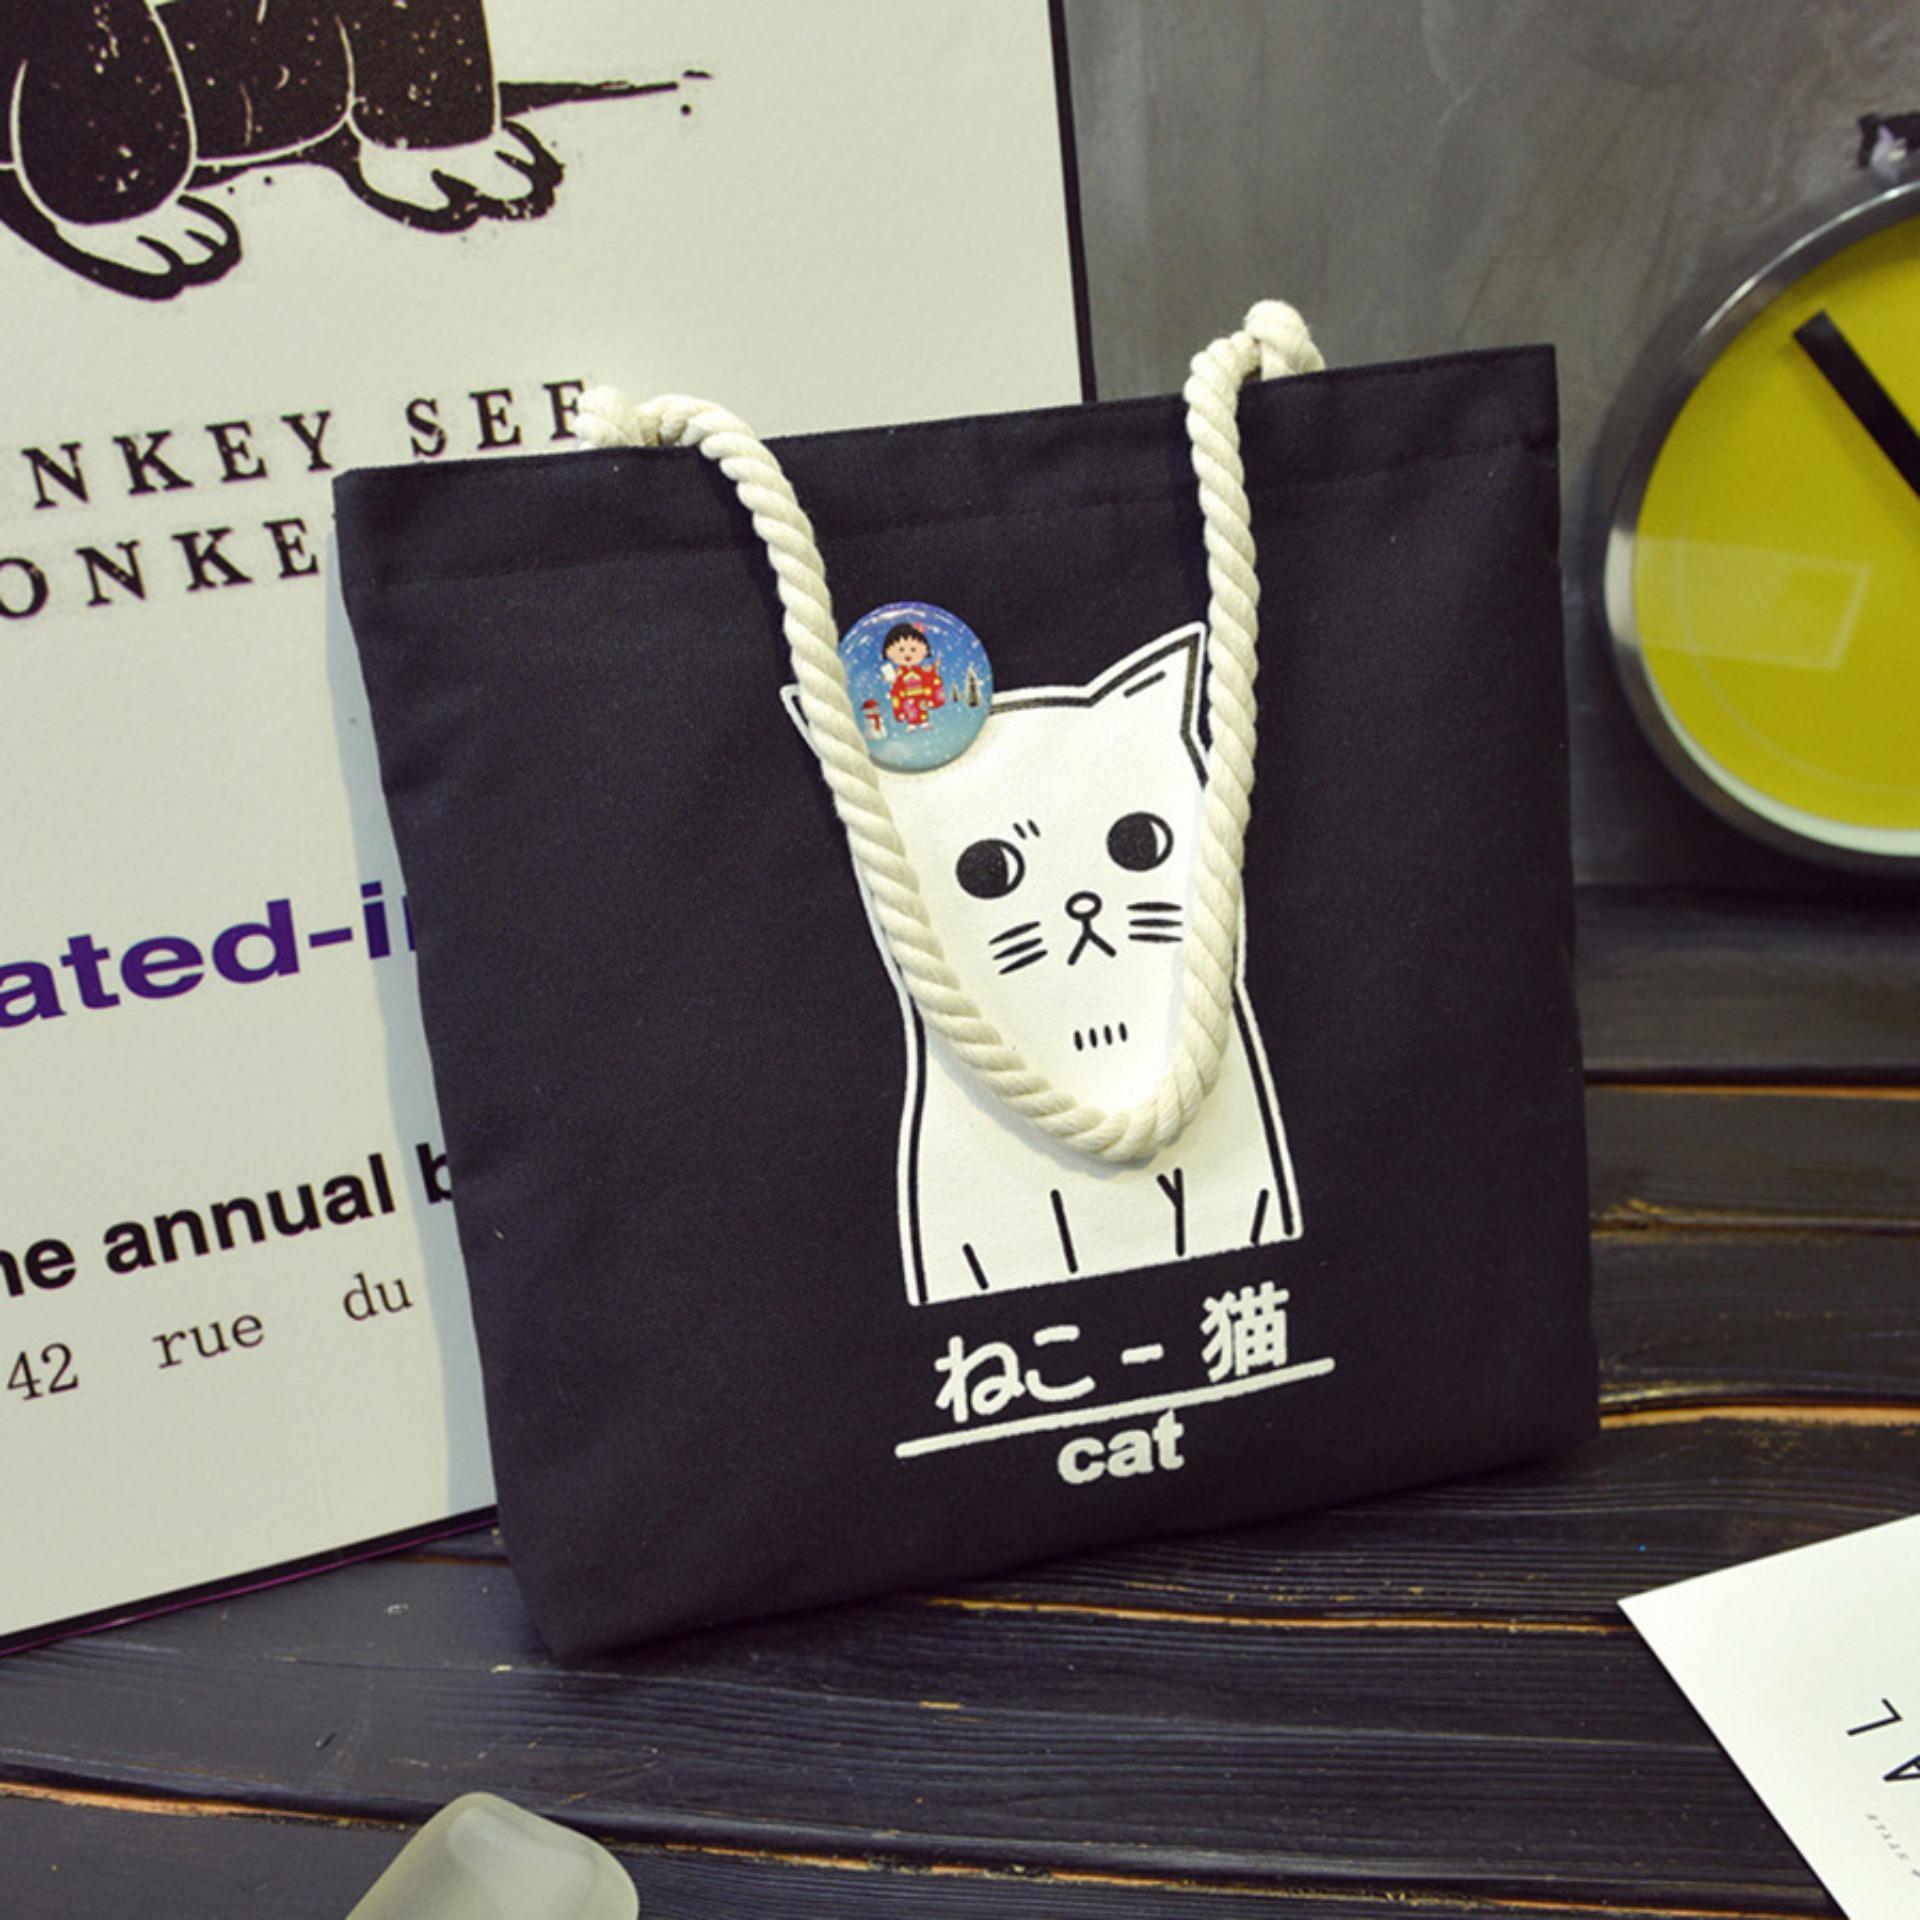 Spek Tokyo Cat Canvas Tote Bag